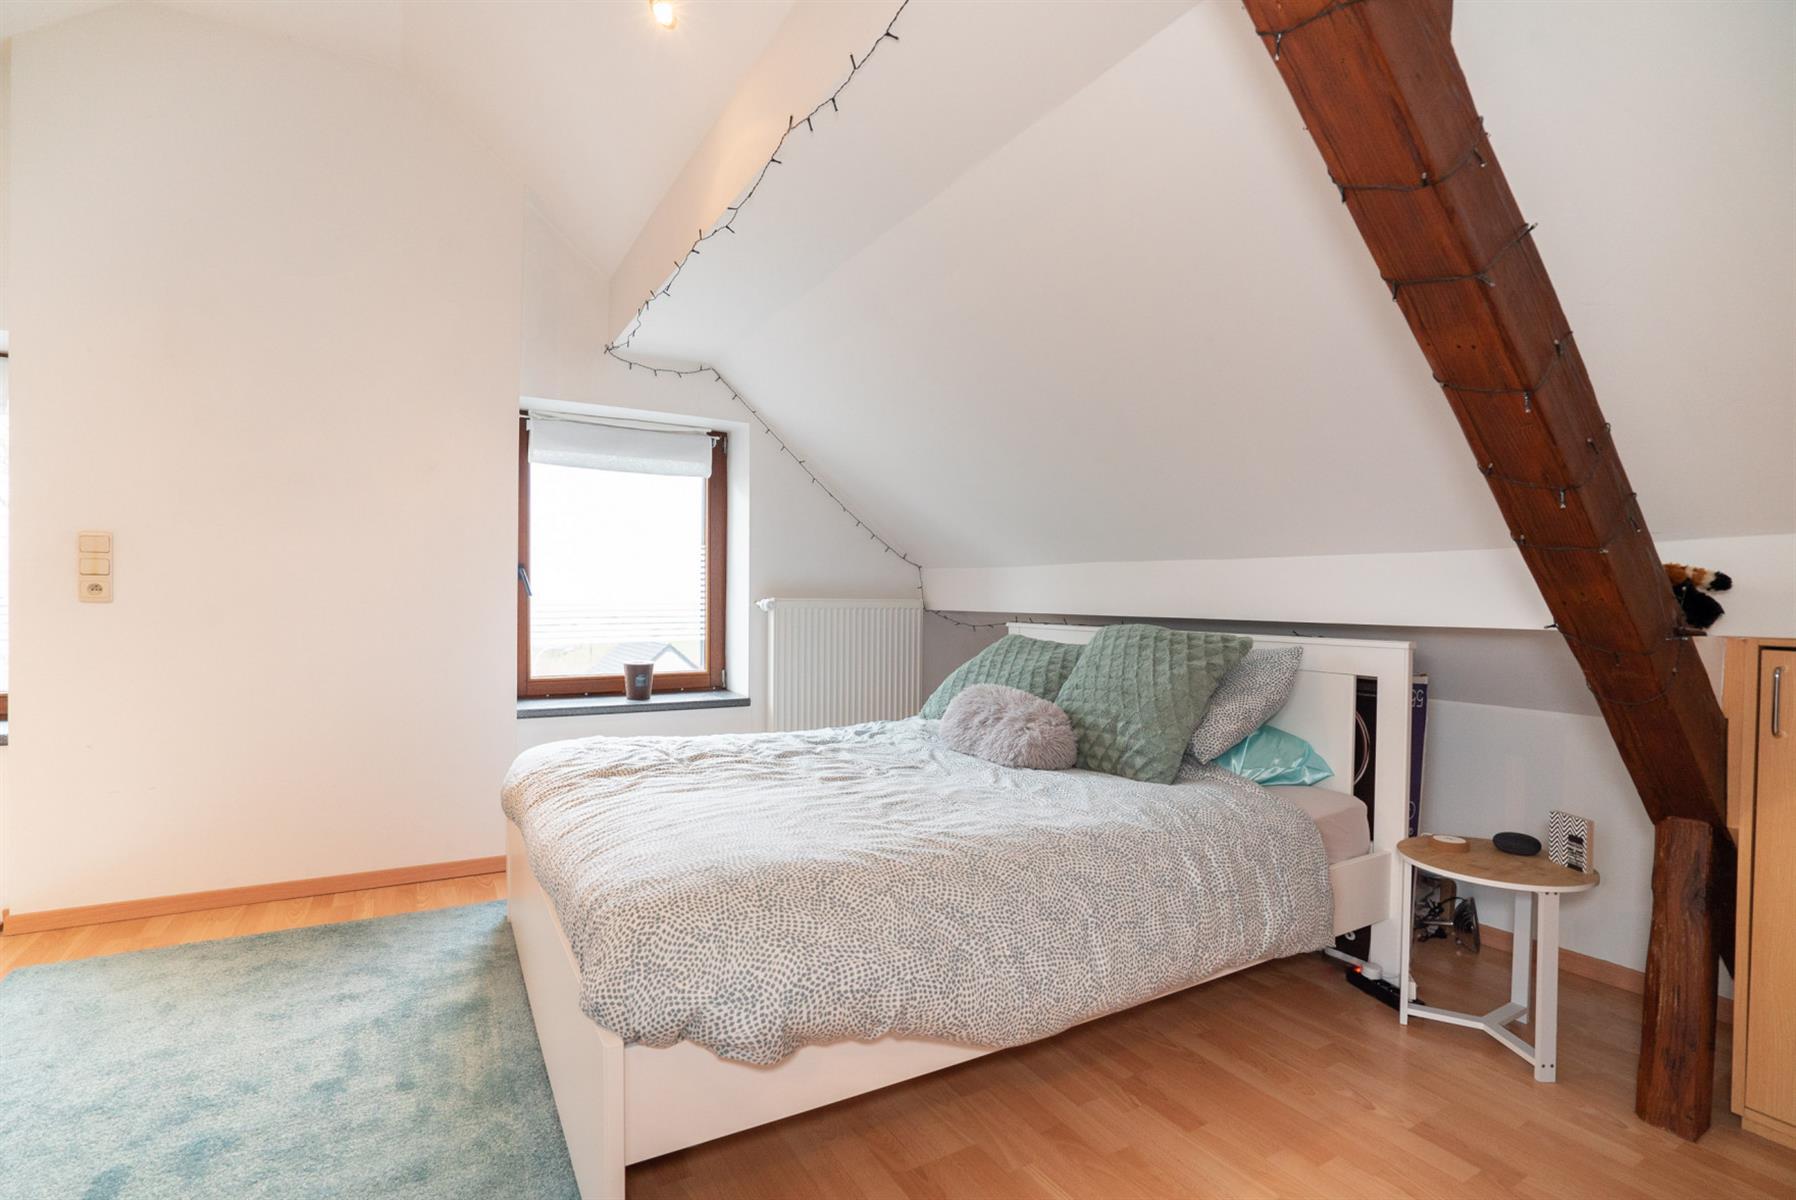 Appartement - Welkenraedt Henri-Chapelle - #4270870-6